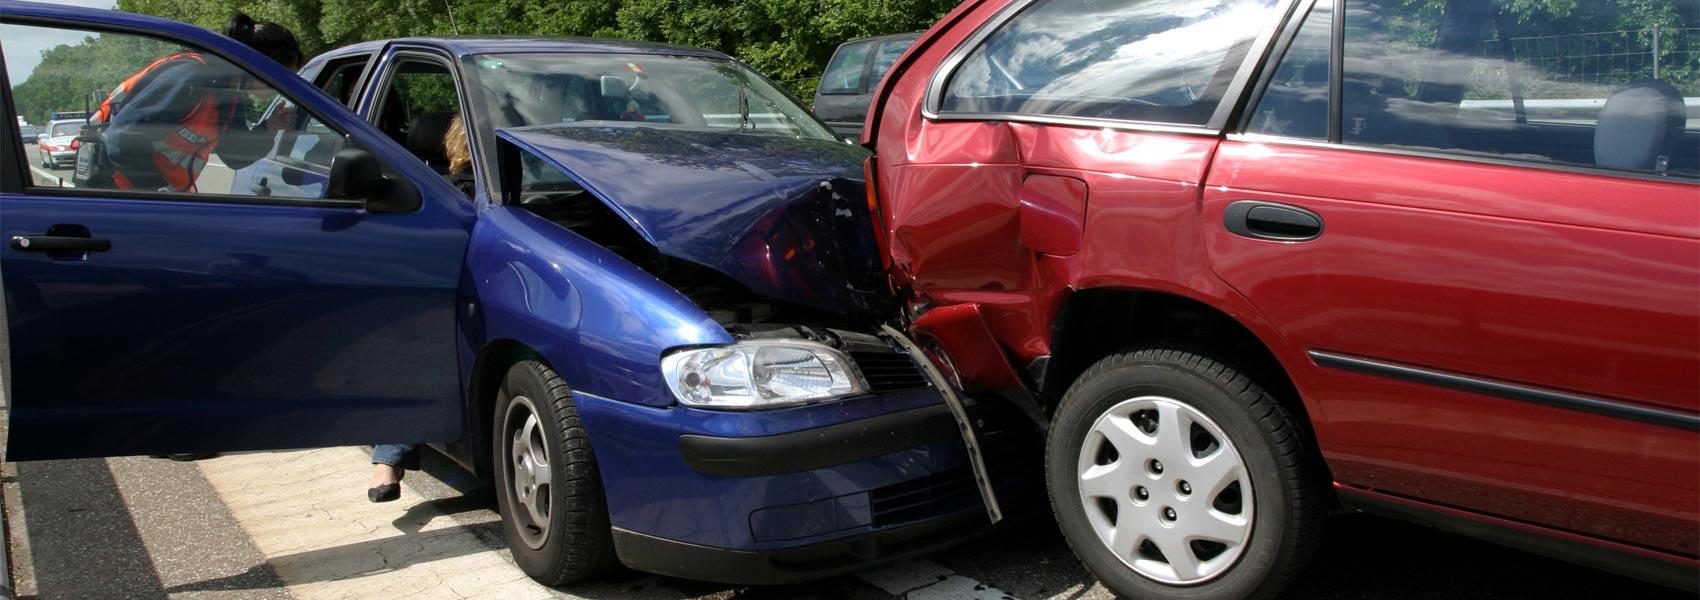 Ongevalsanalyse